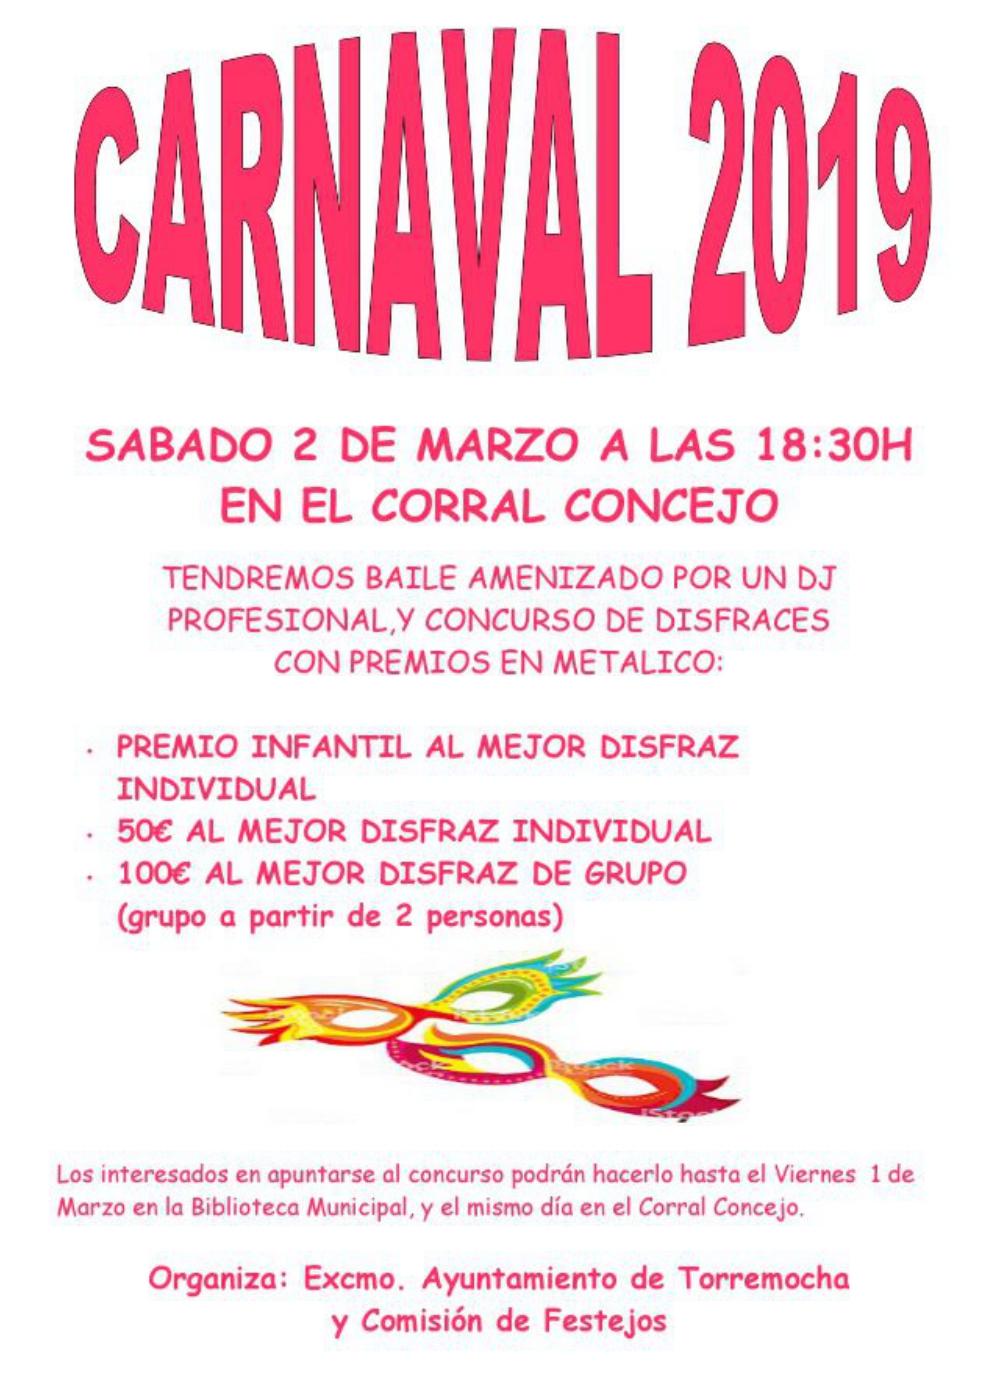 Carnaval 2019 - Torremocha (Cáceres)